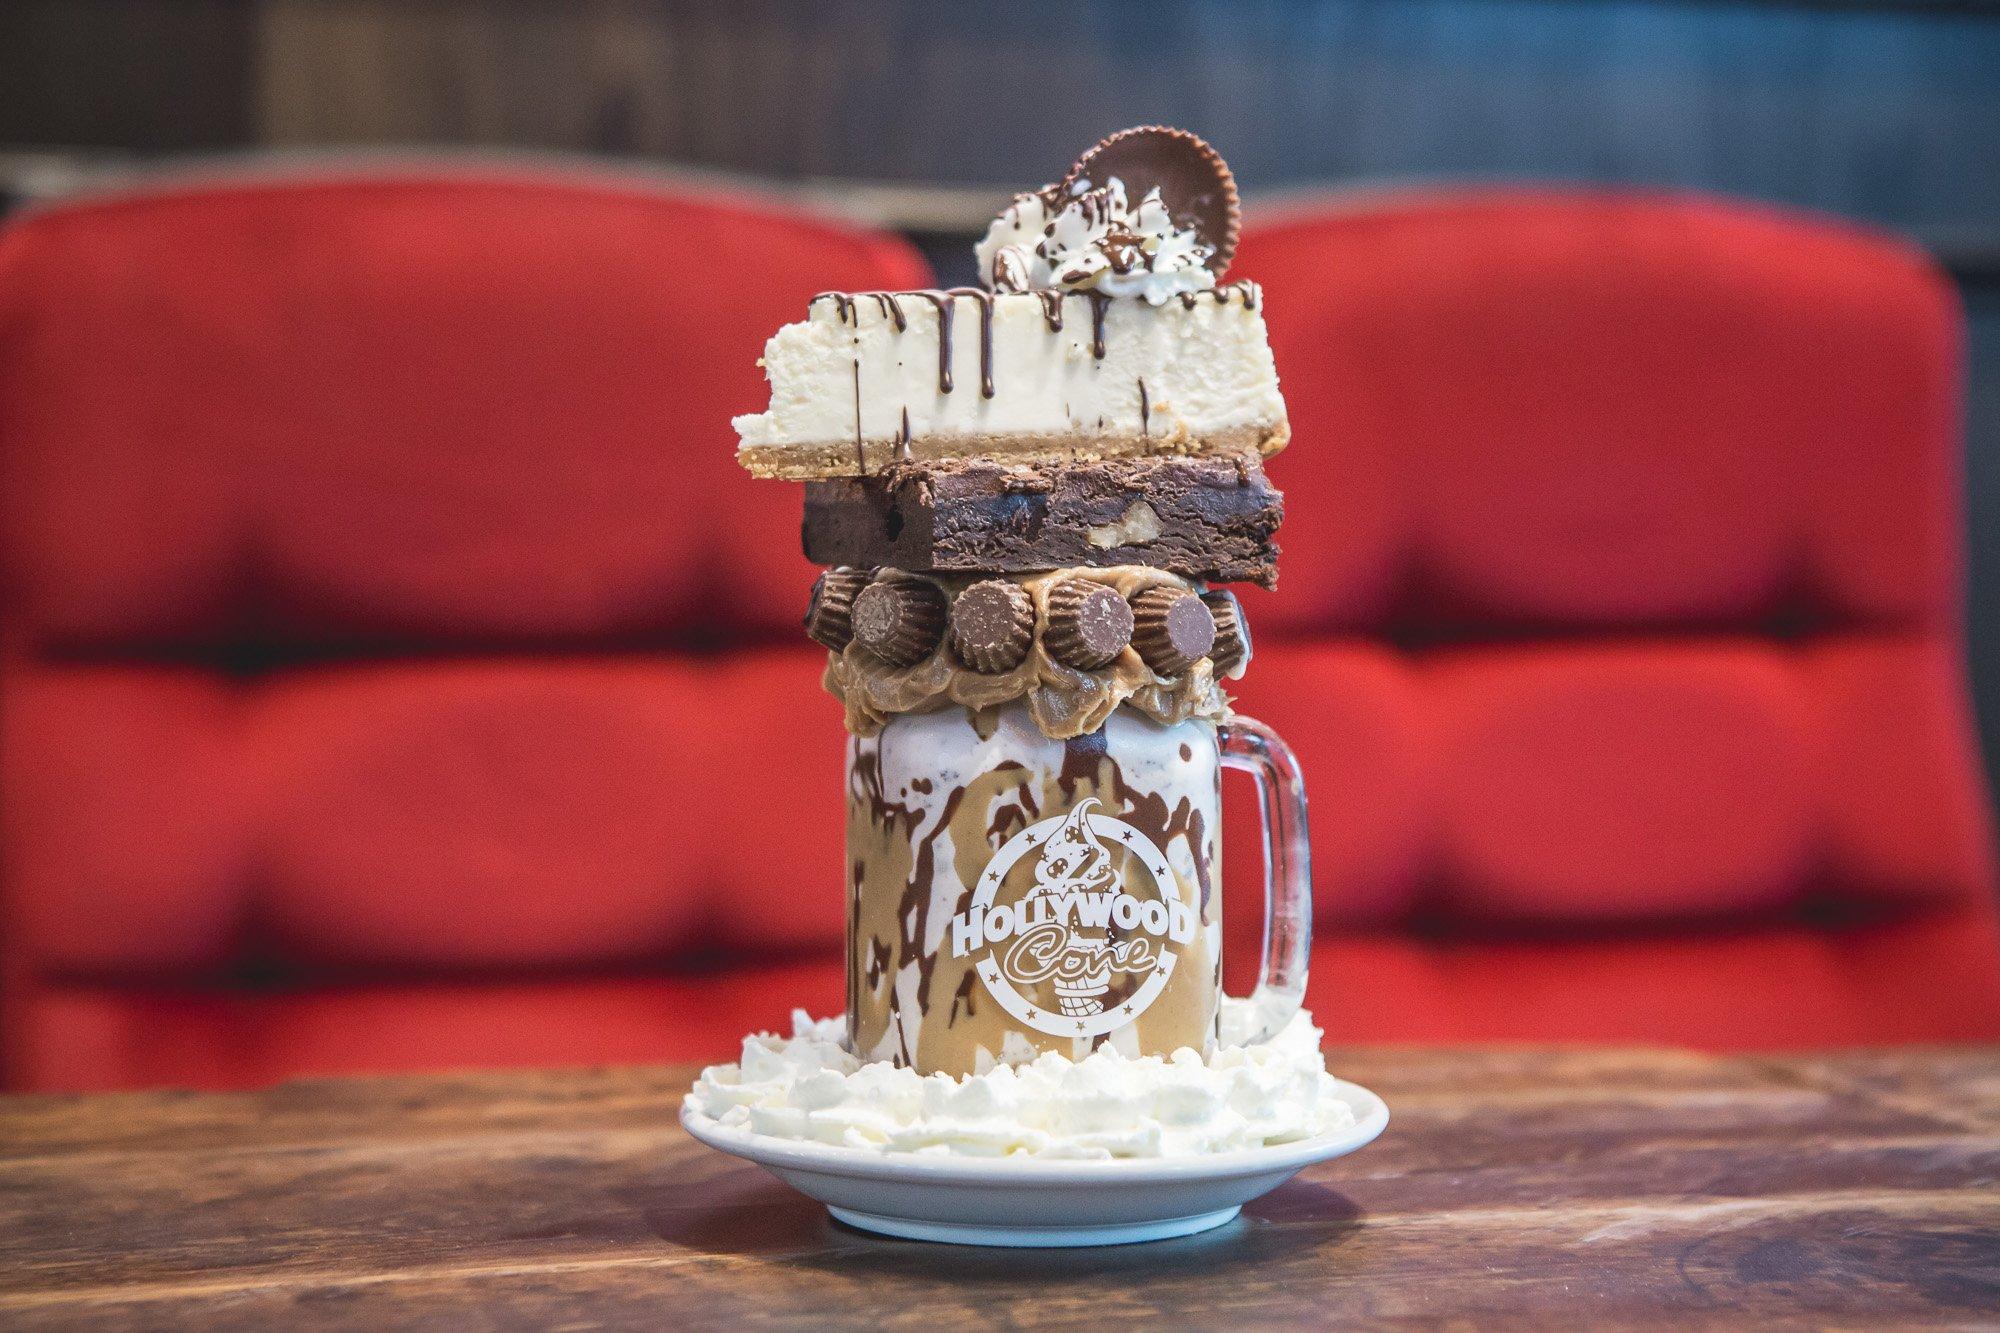 hollywood cone milkshake